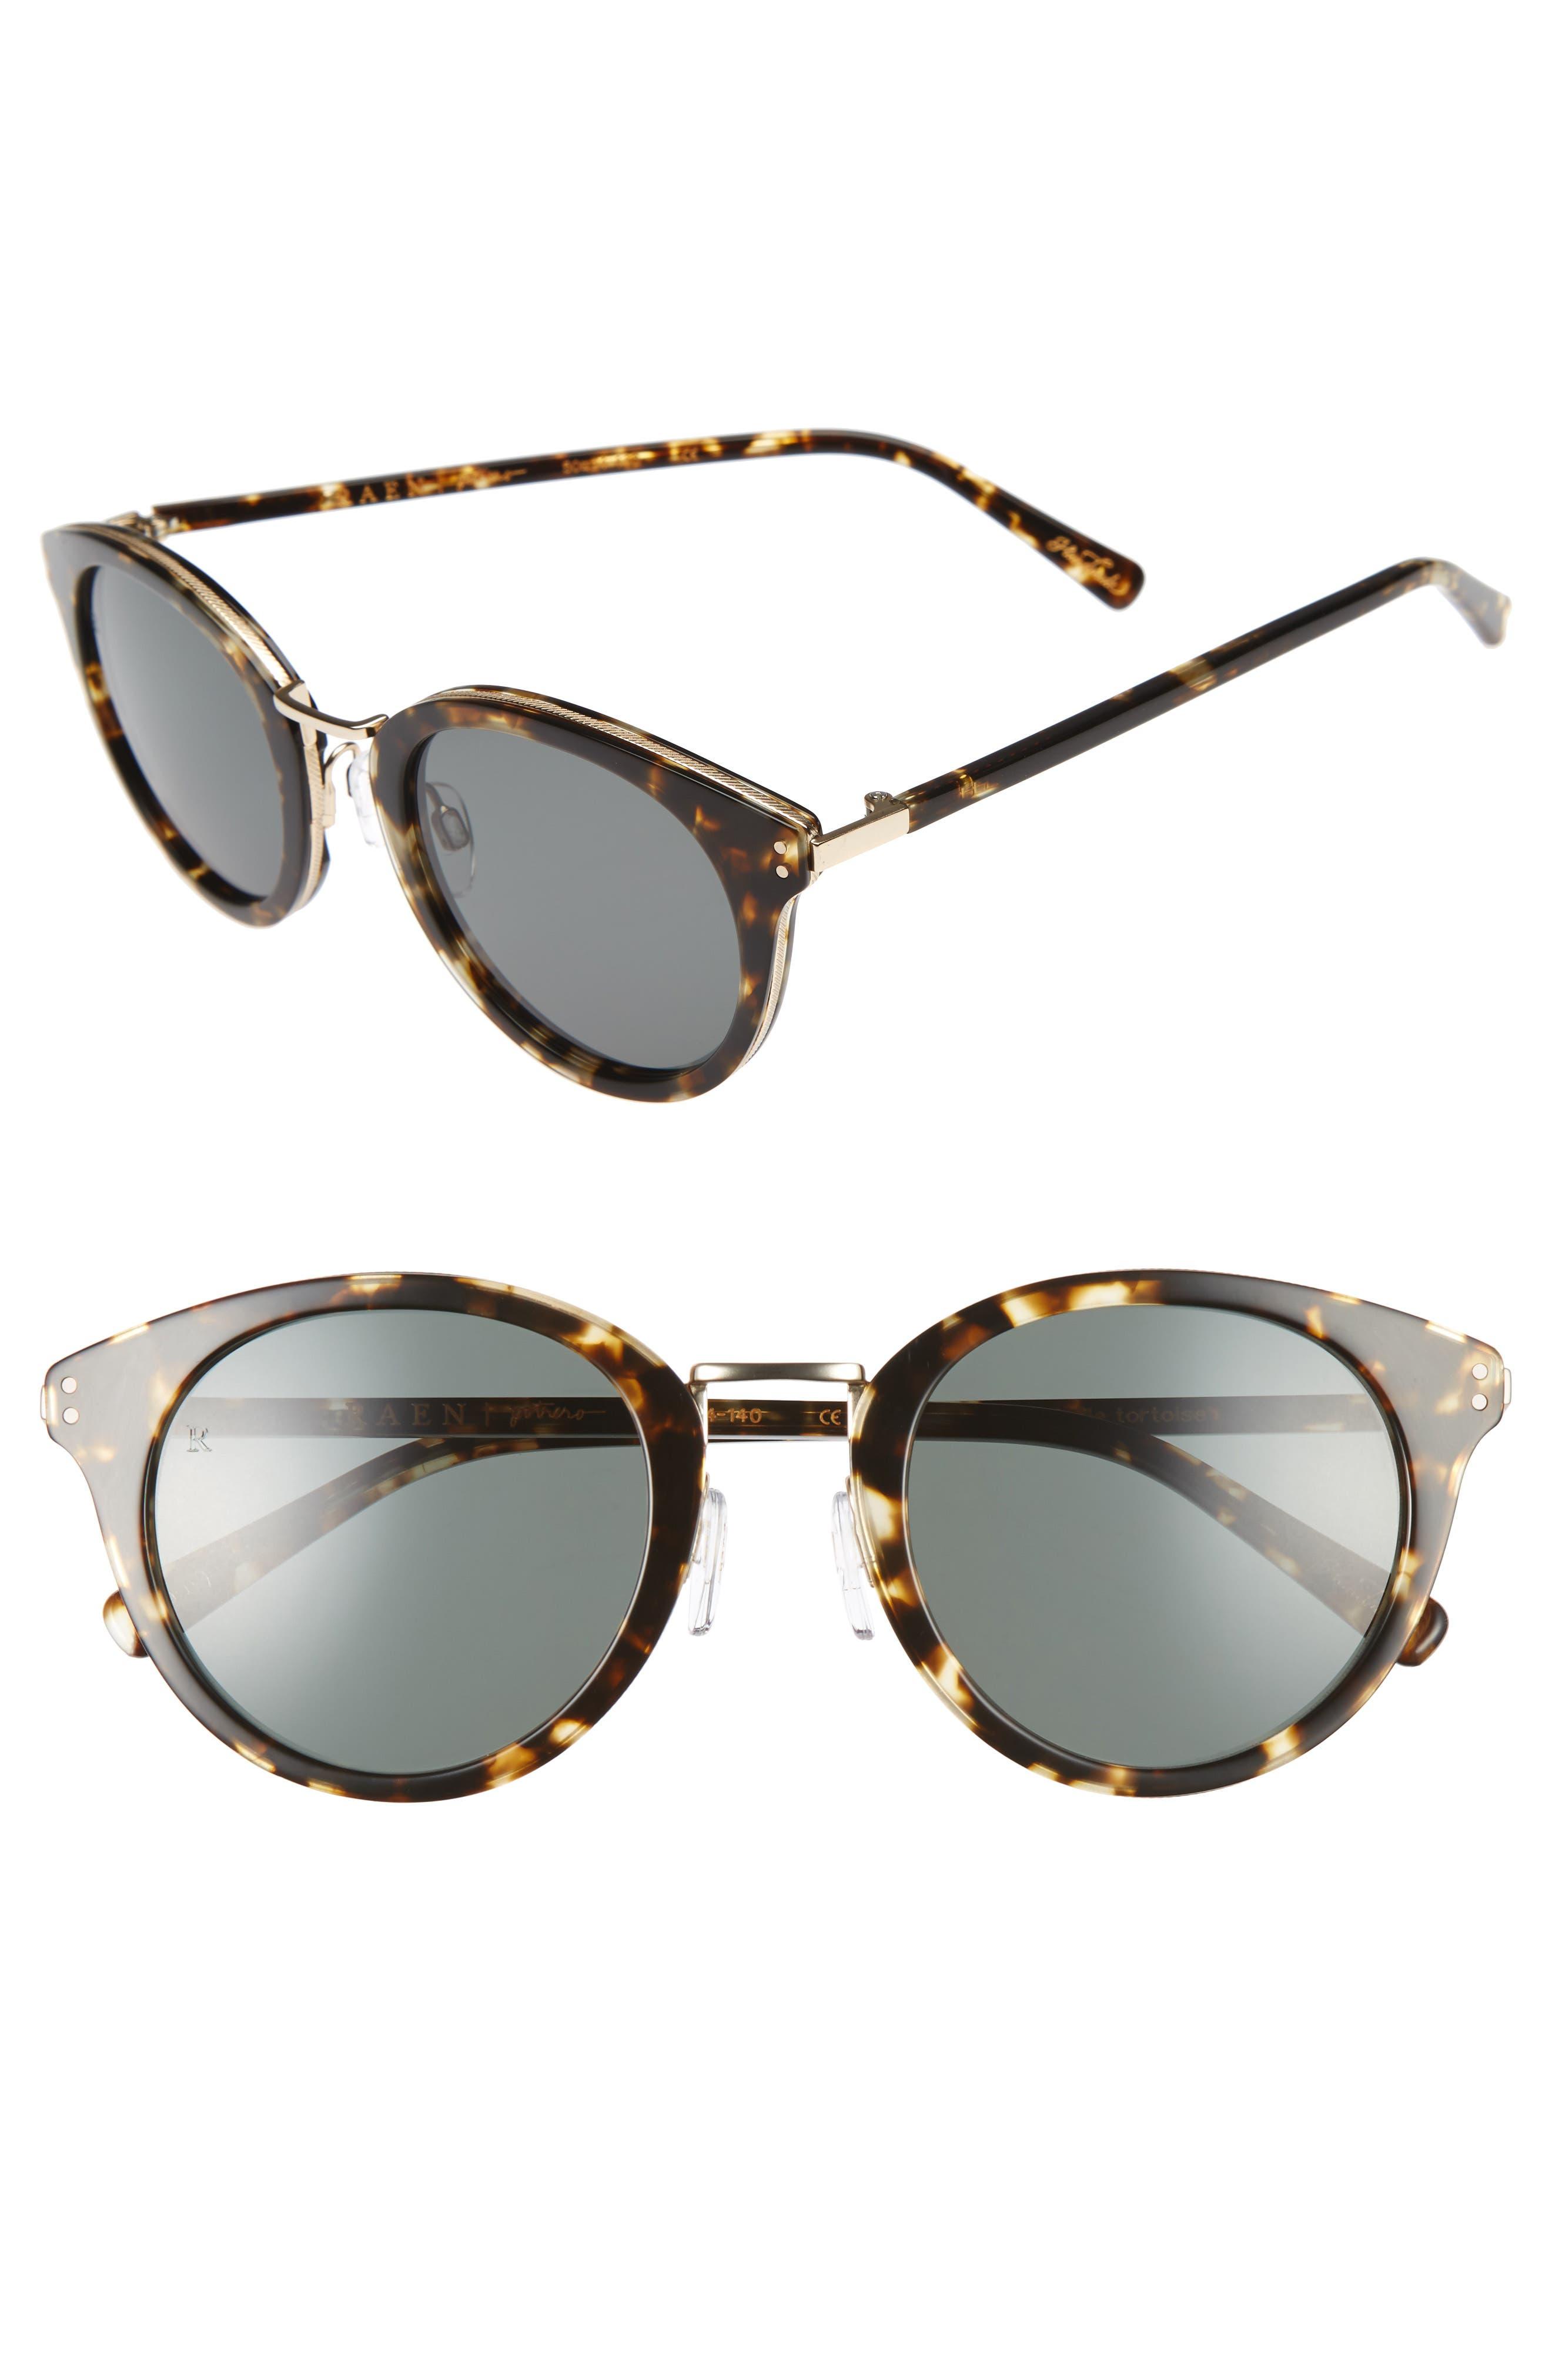 Potrero 50mm Sunglasses,                             Main thumbnail 1, color,                             Brindle Tortoise